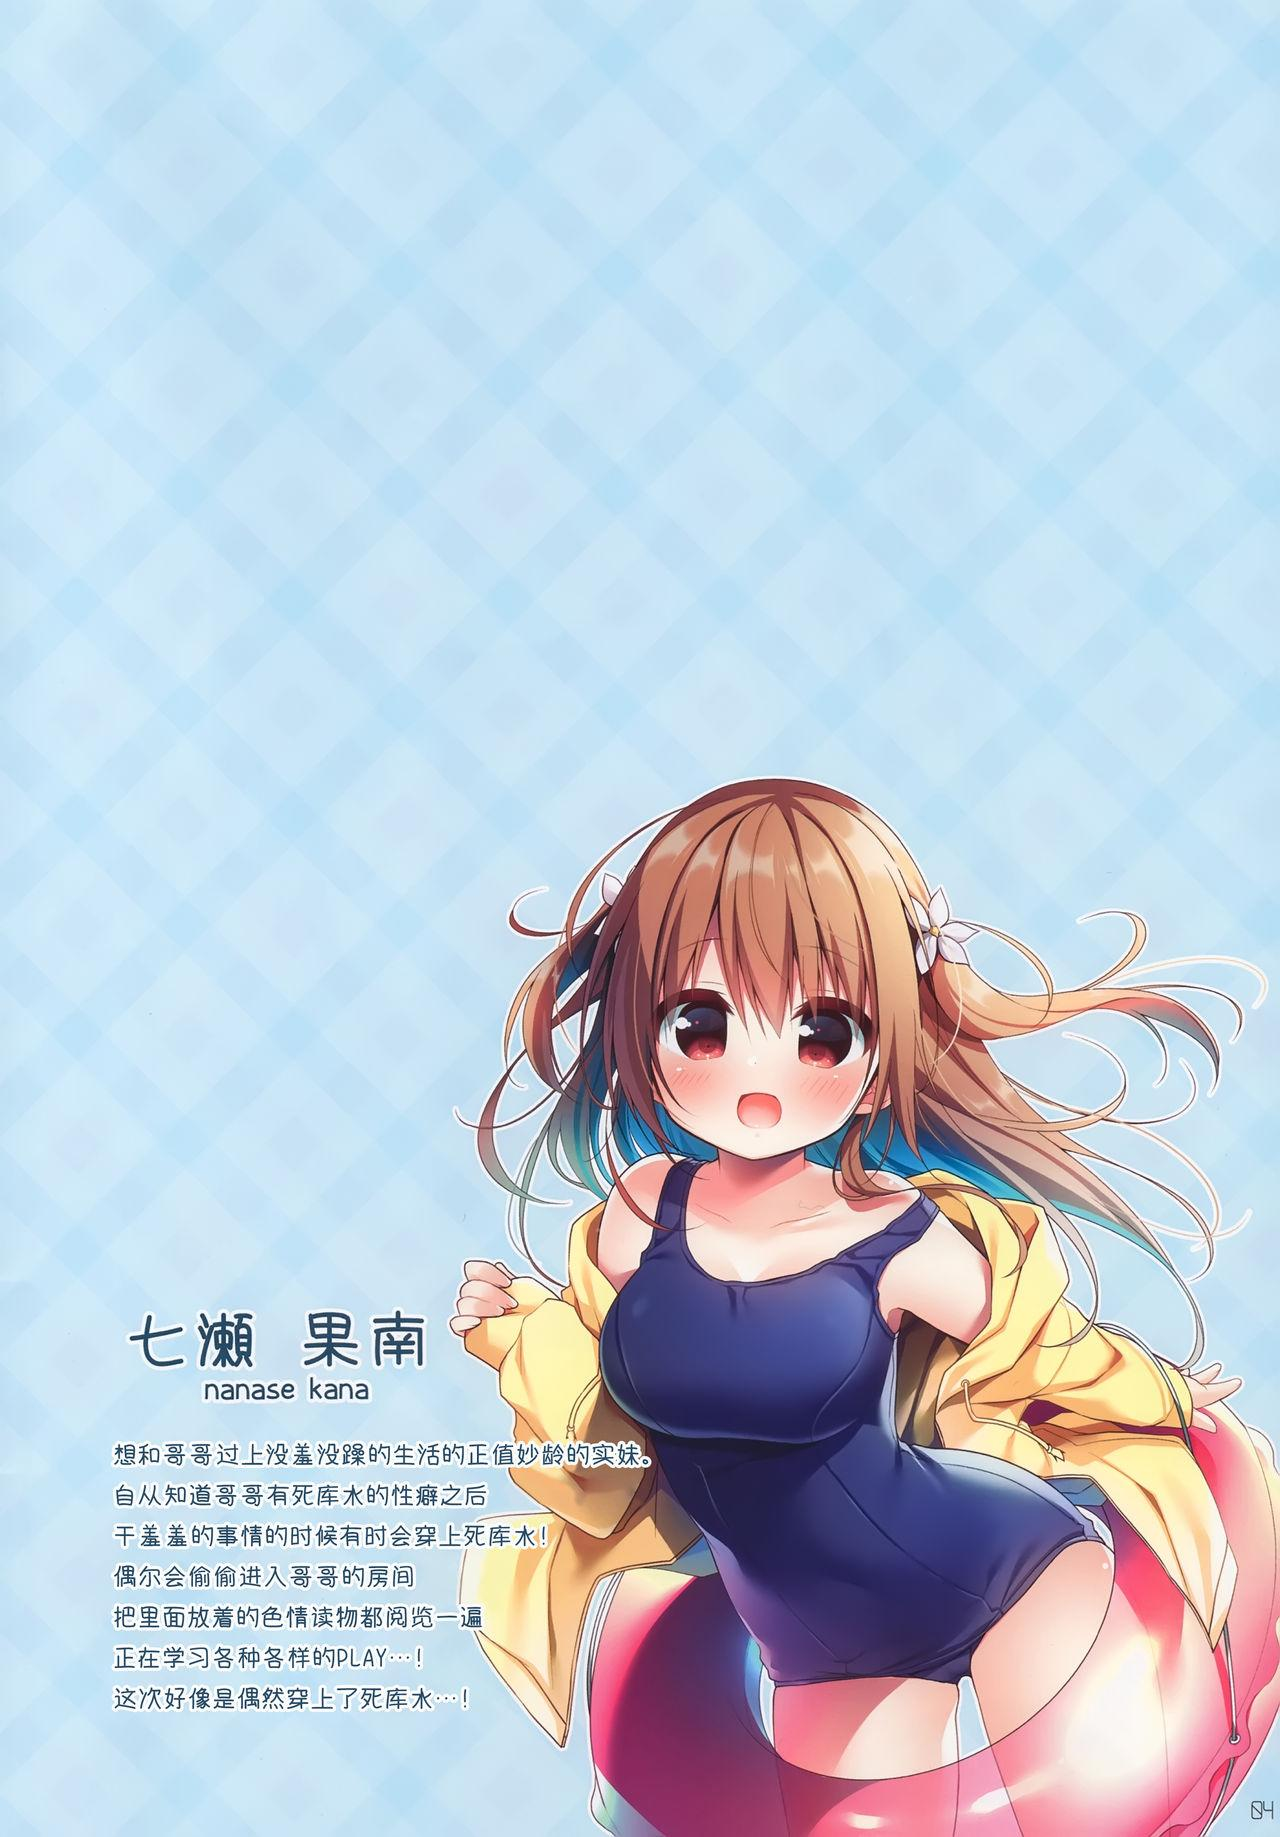 Onii-chan to Love Love Daisakusen 5 3